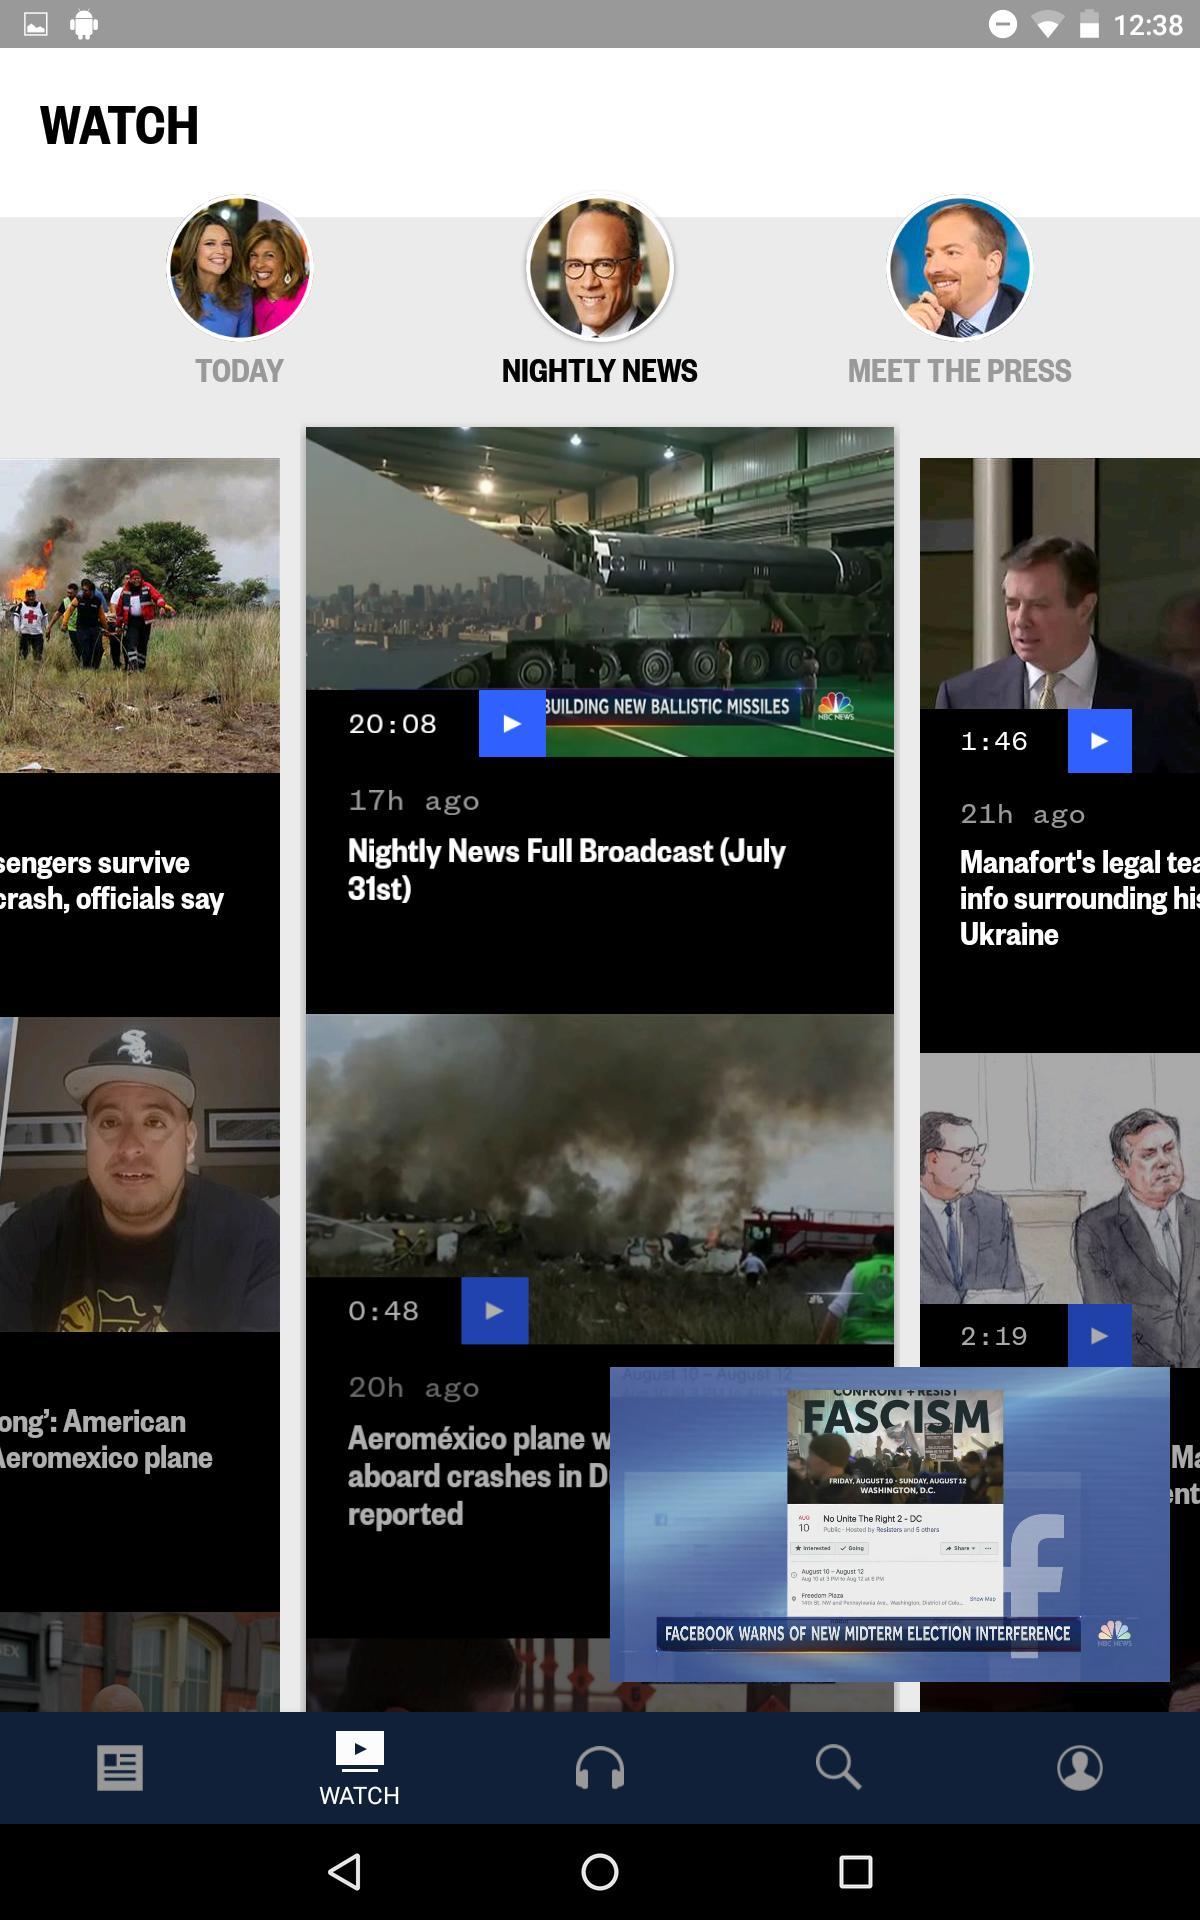 NBC News: Breaking News, US News & Live Video 6.0.11 Screenshot 17